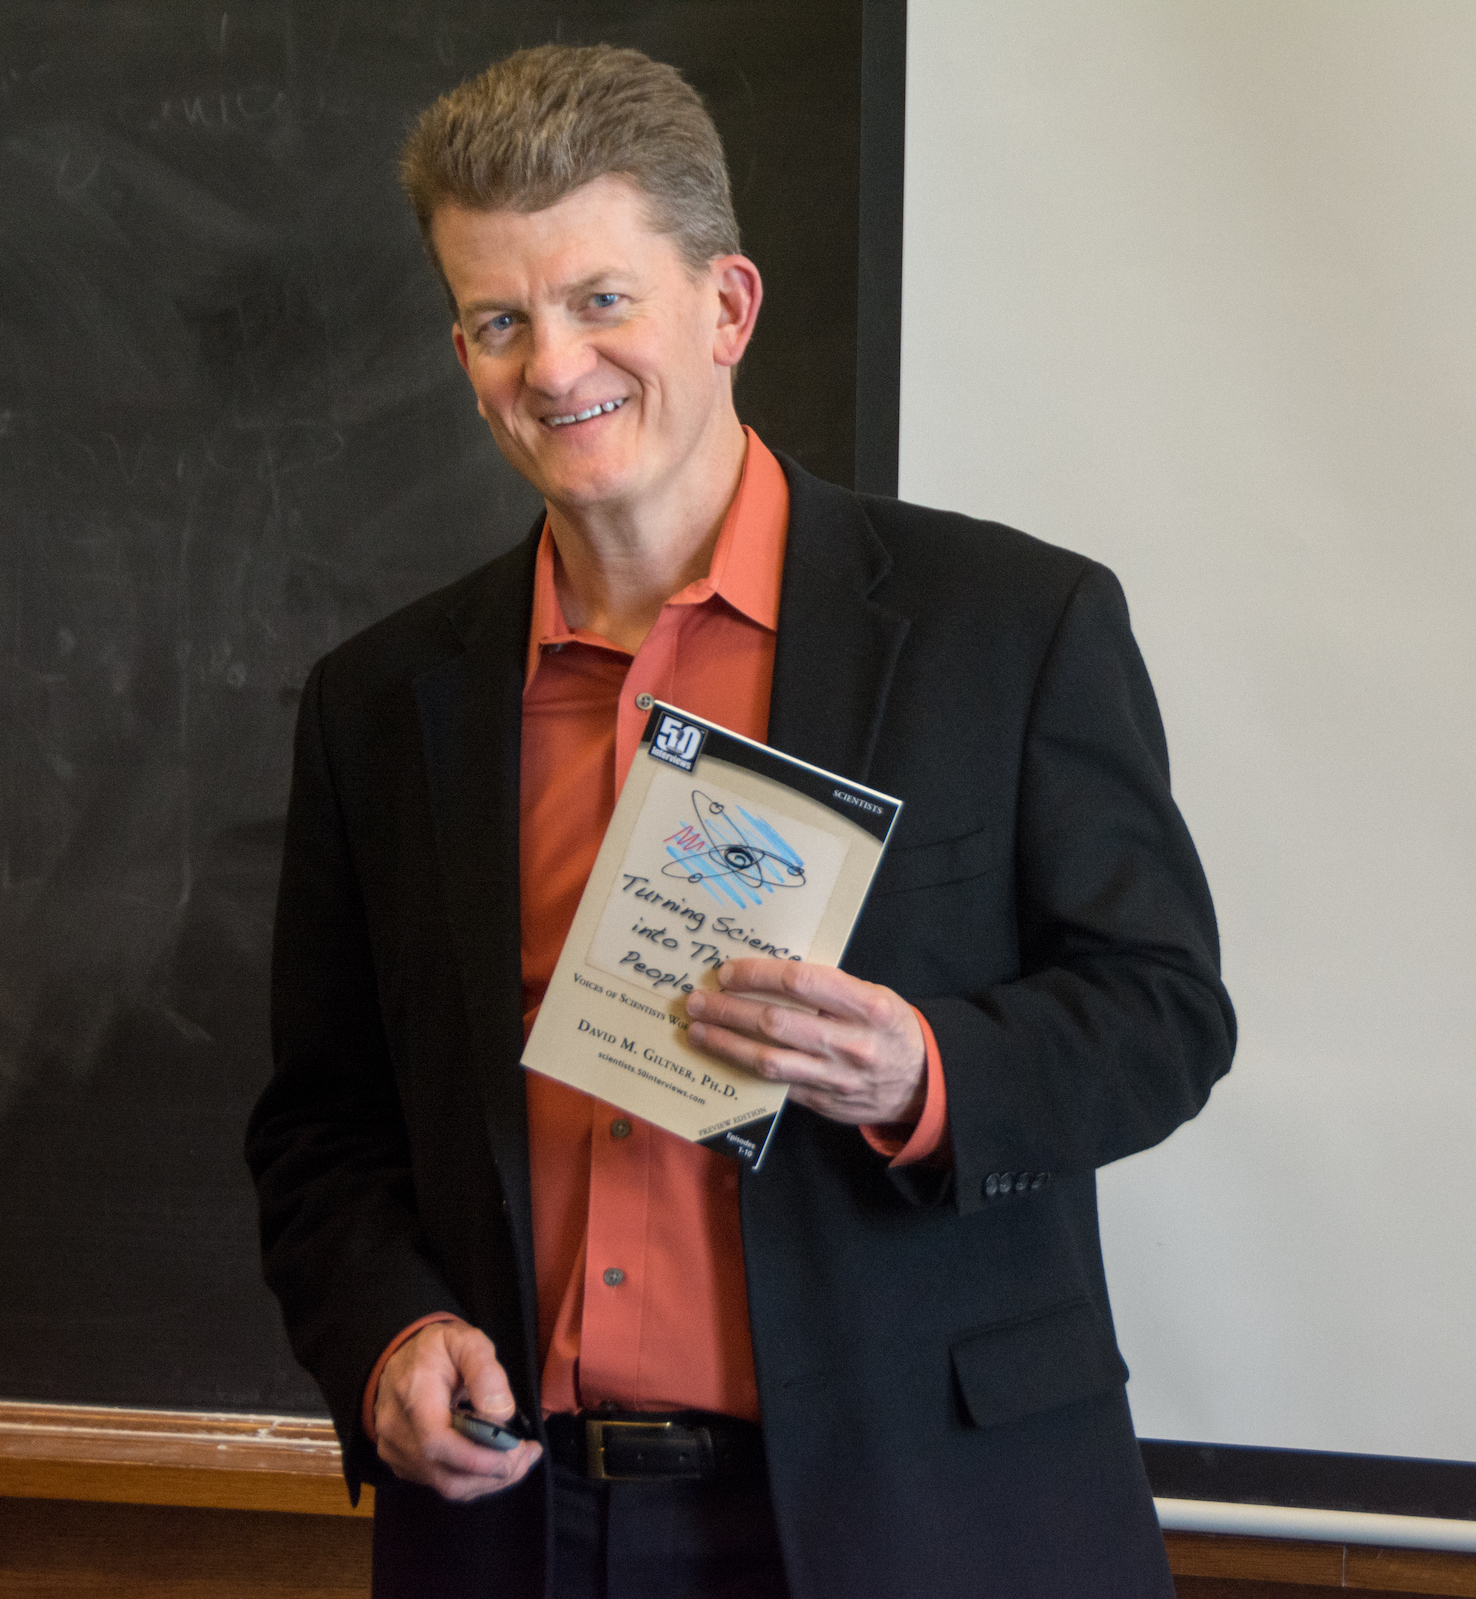 David M Giltner, Industry Career Coach